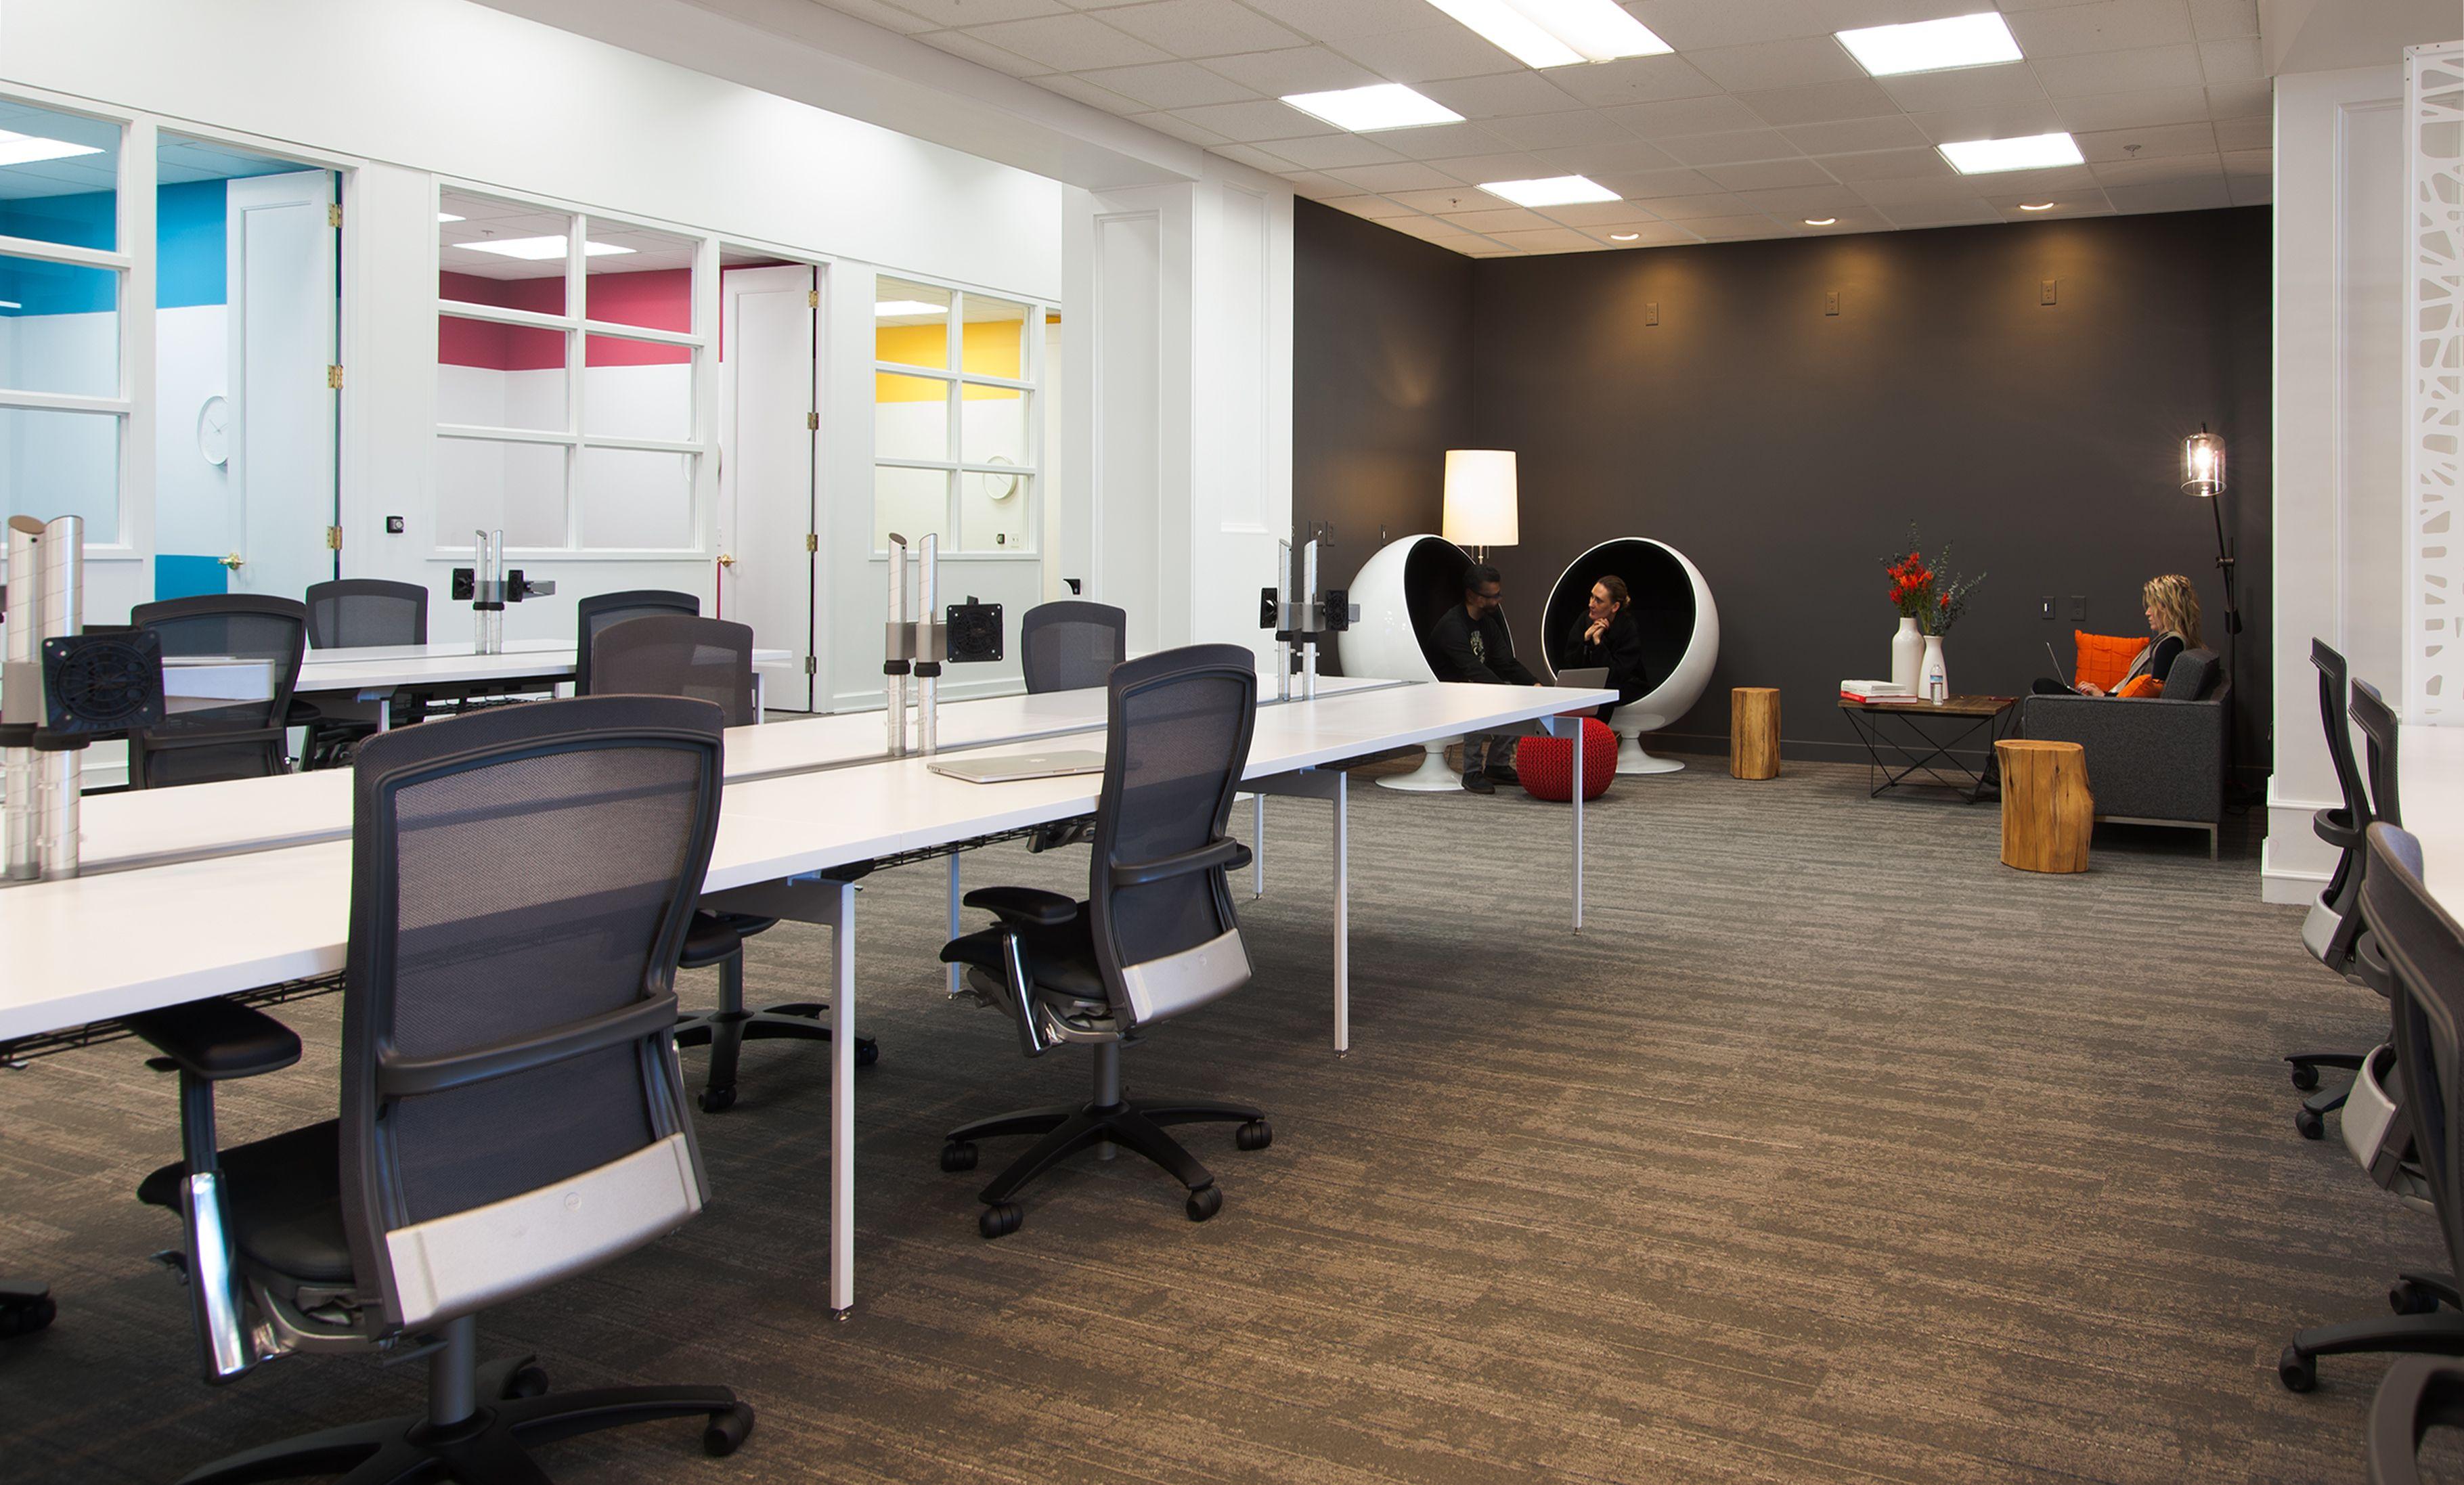 New Shoprunner Headquarters In Conshohocken Pa Smalloffice Commercialspaces Commercialinteriors Des Small Space Office Commercial Interiors Small Office